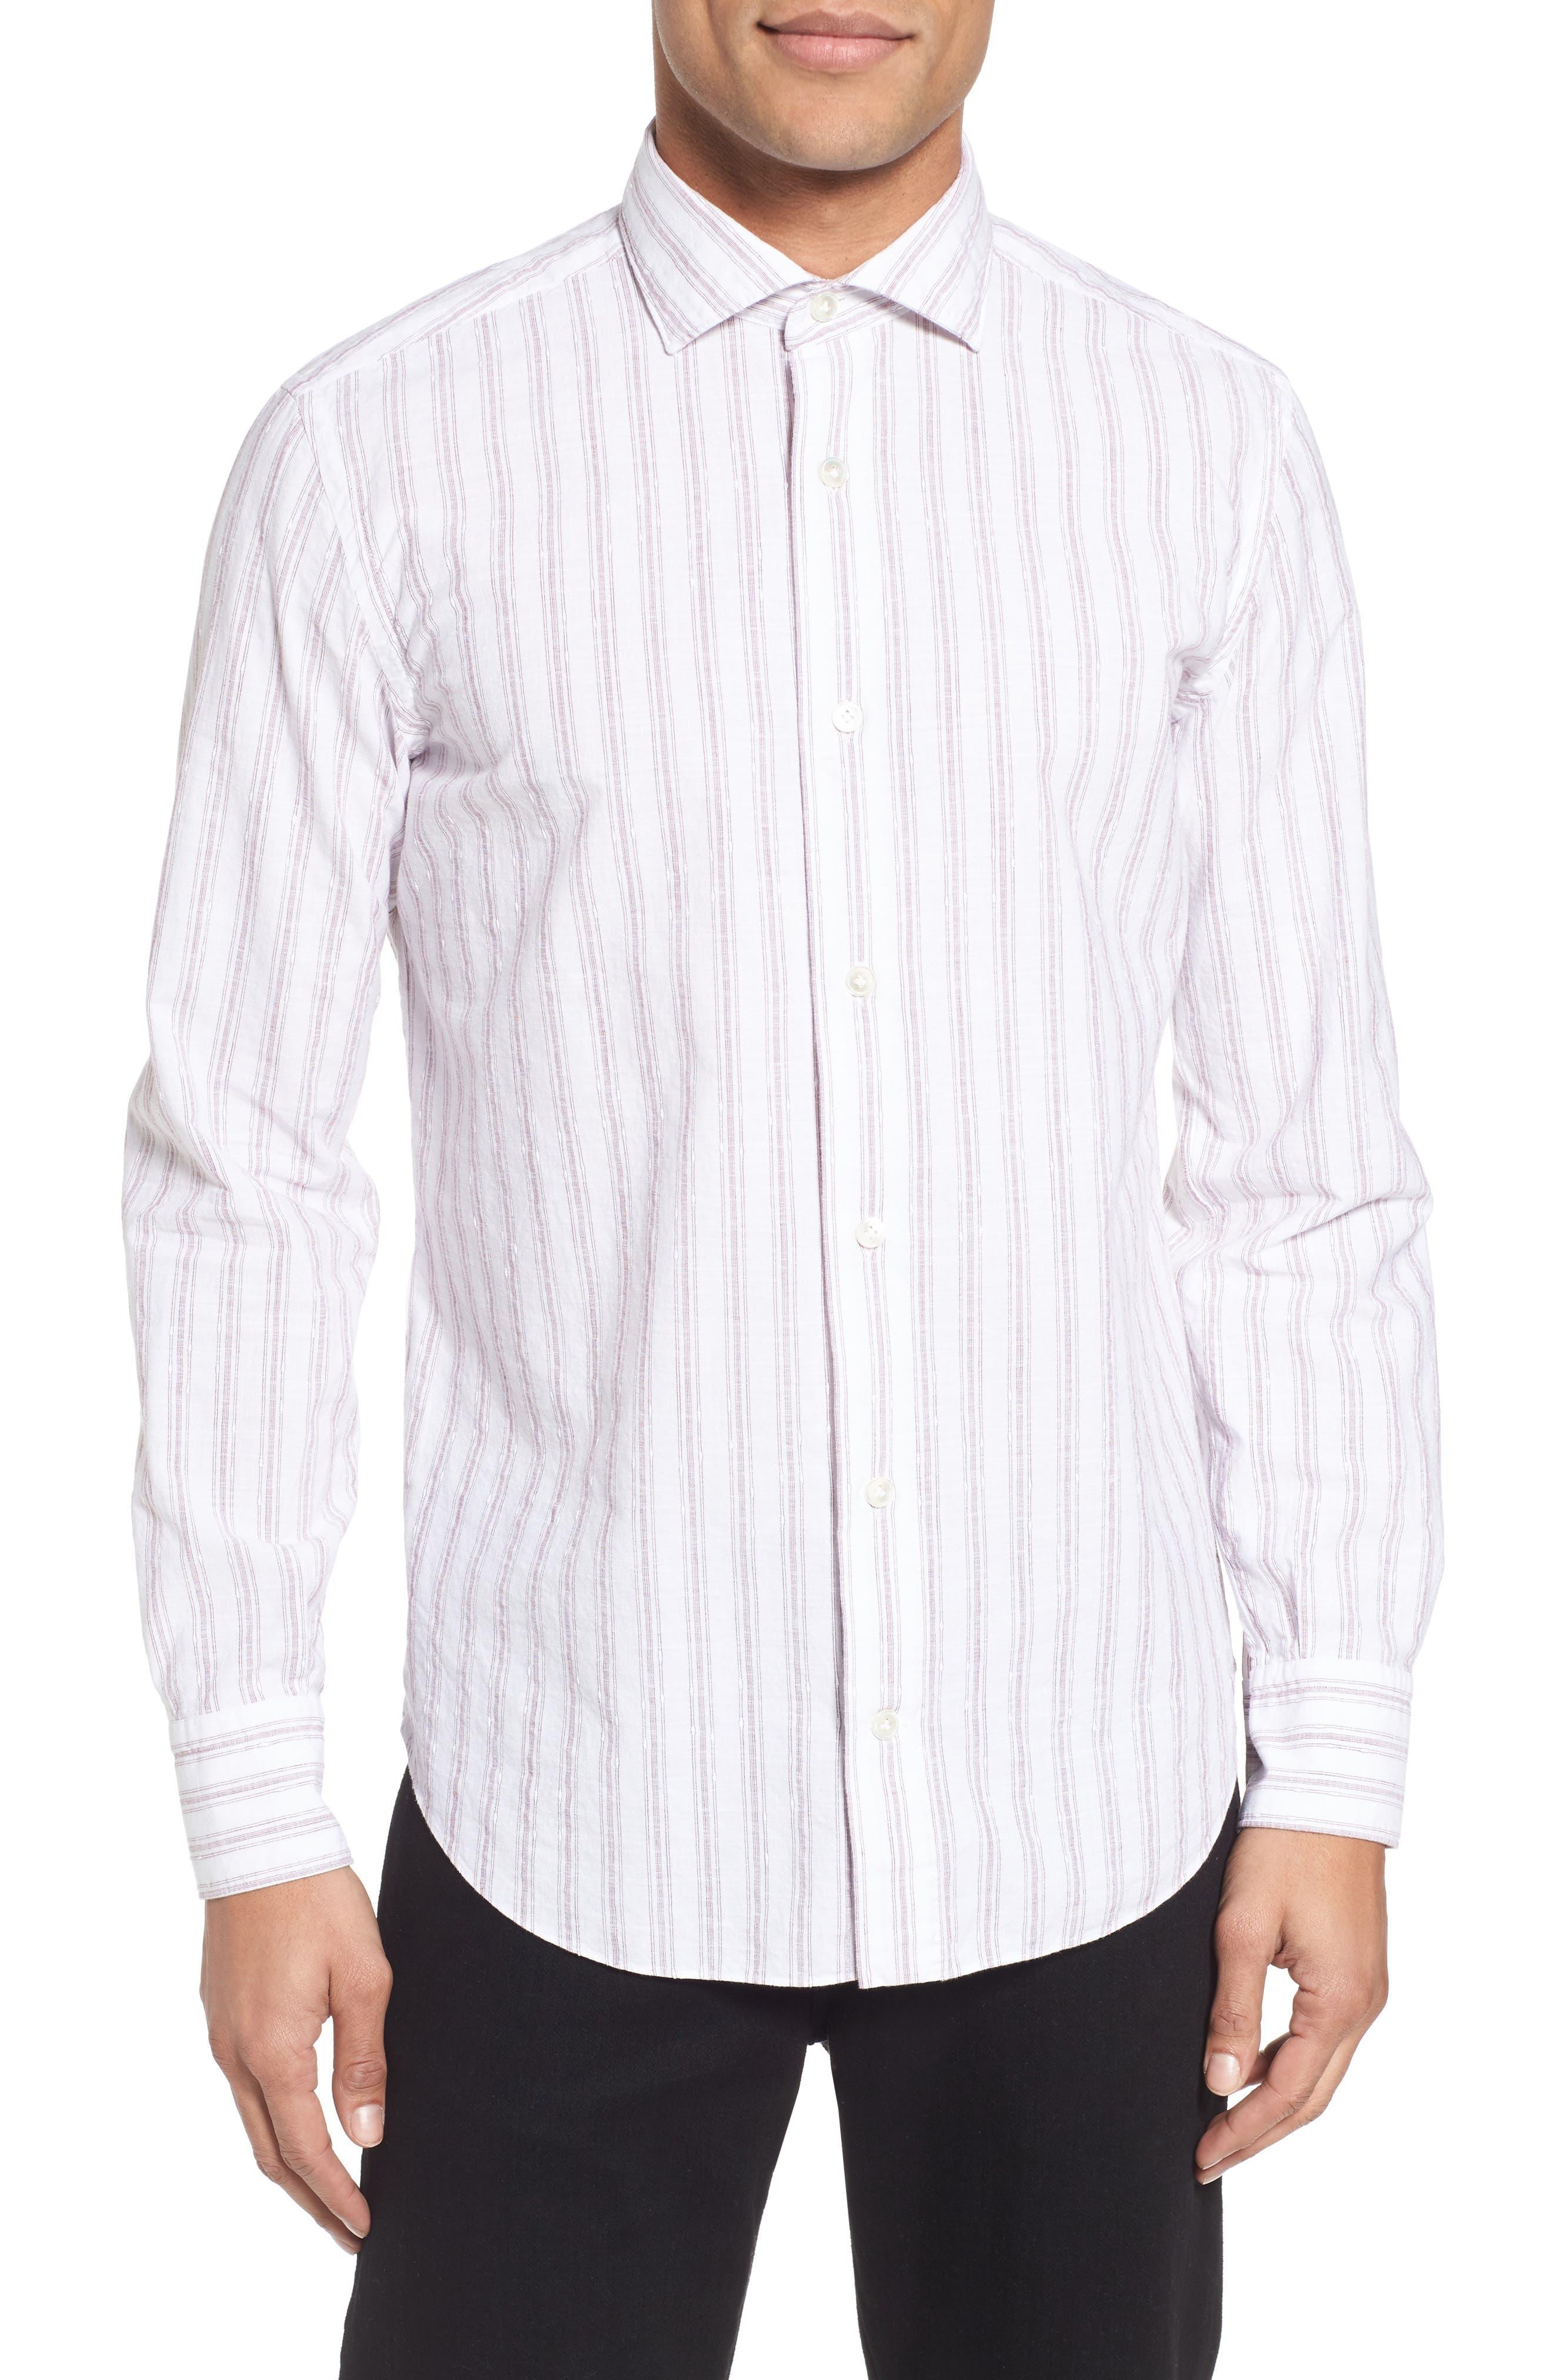 John T Slim Fit Sport Shirt,                         Main,                         color, Blue/ Nat